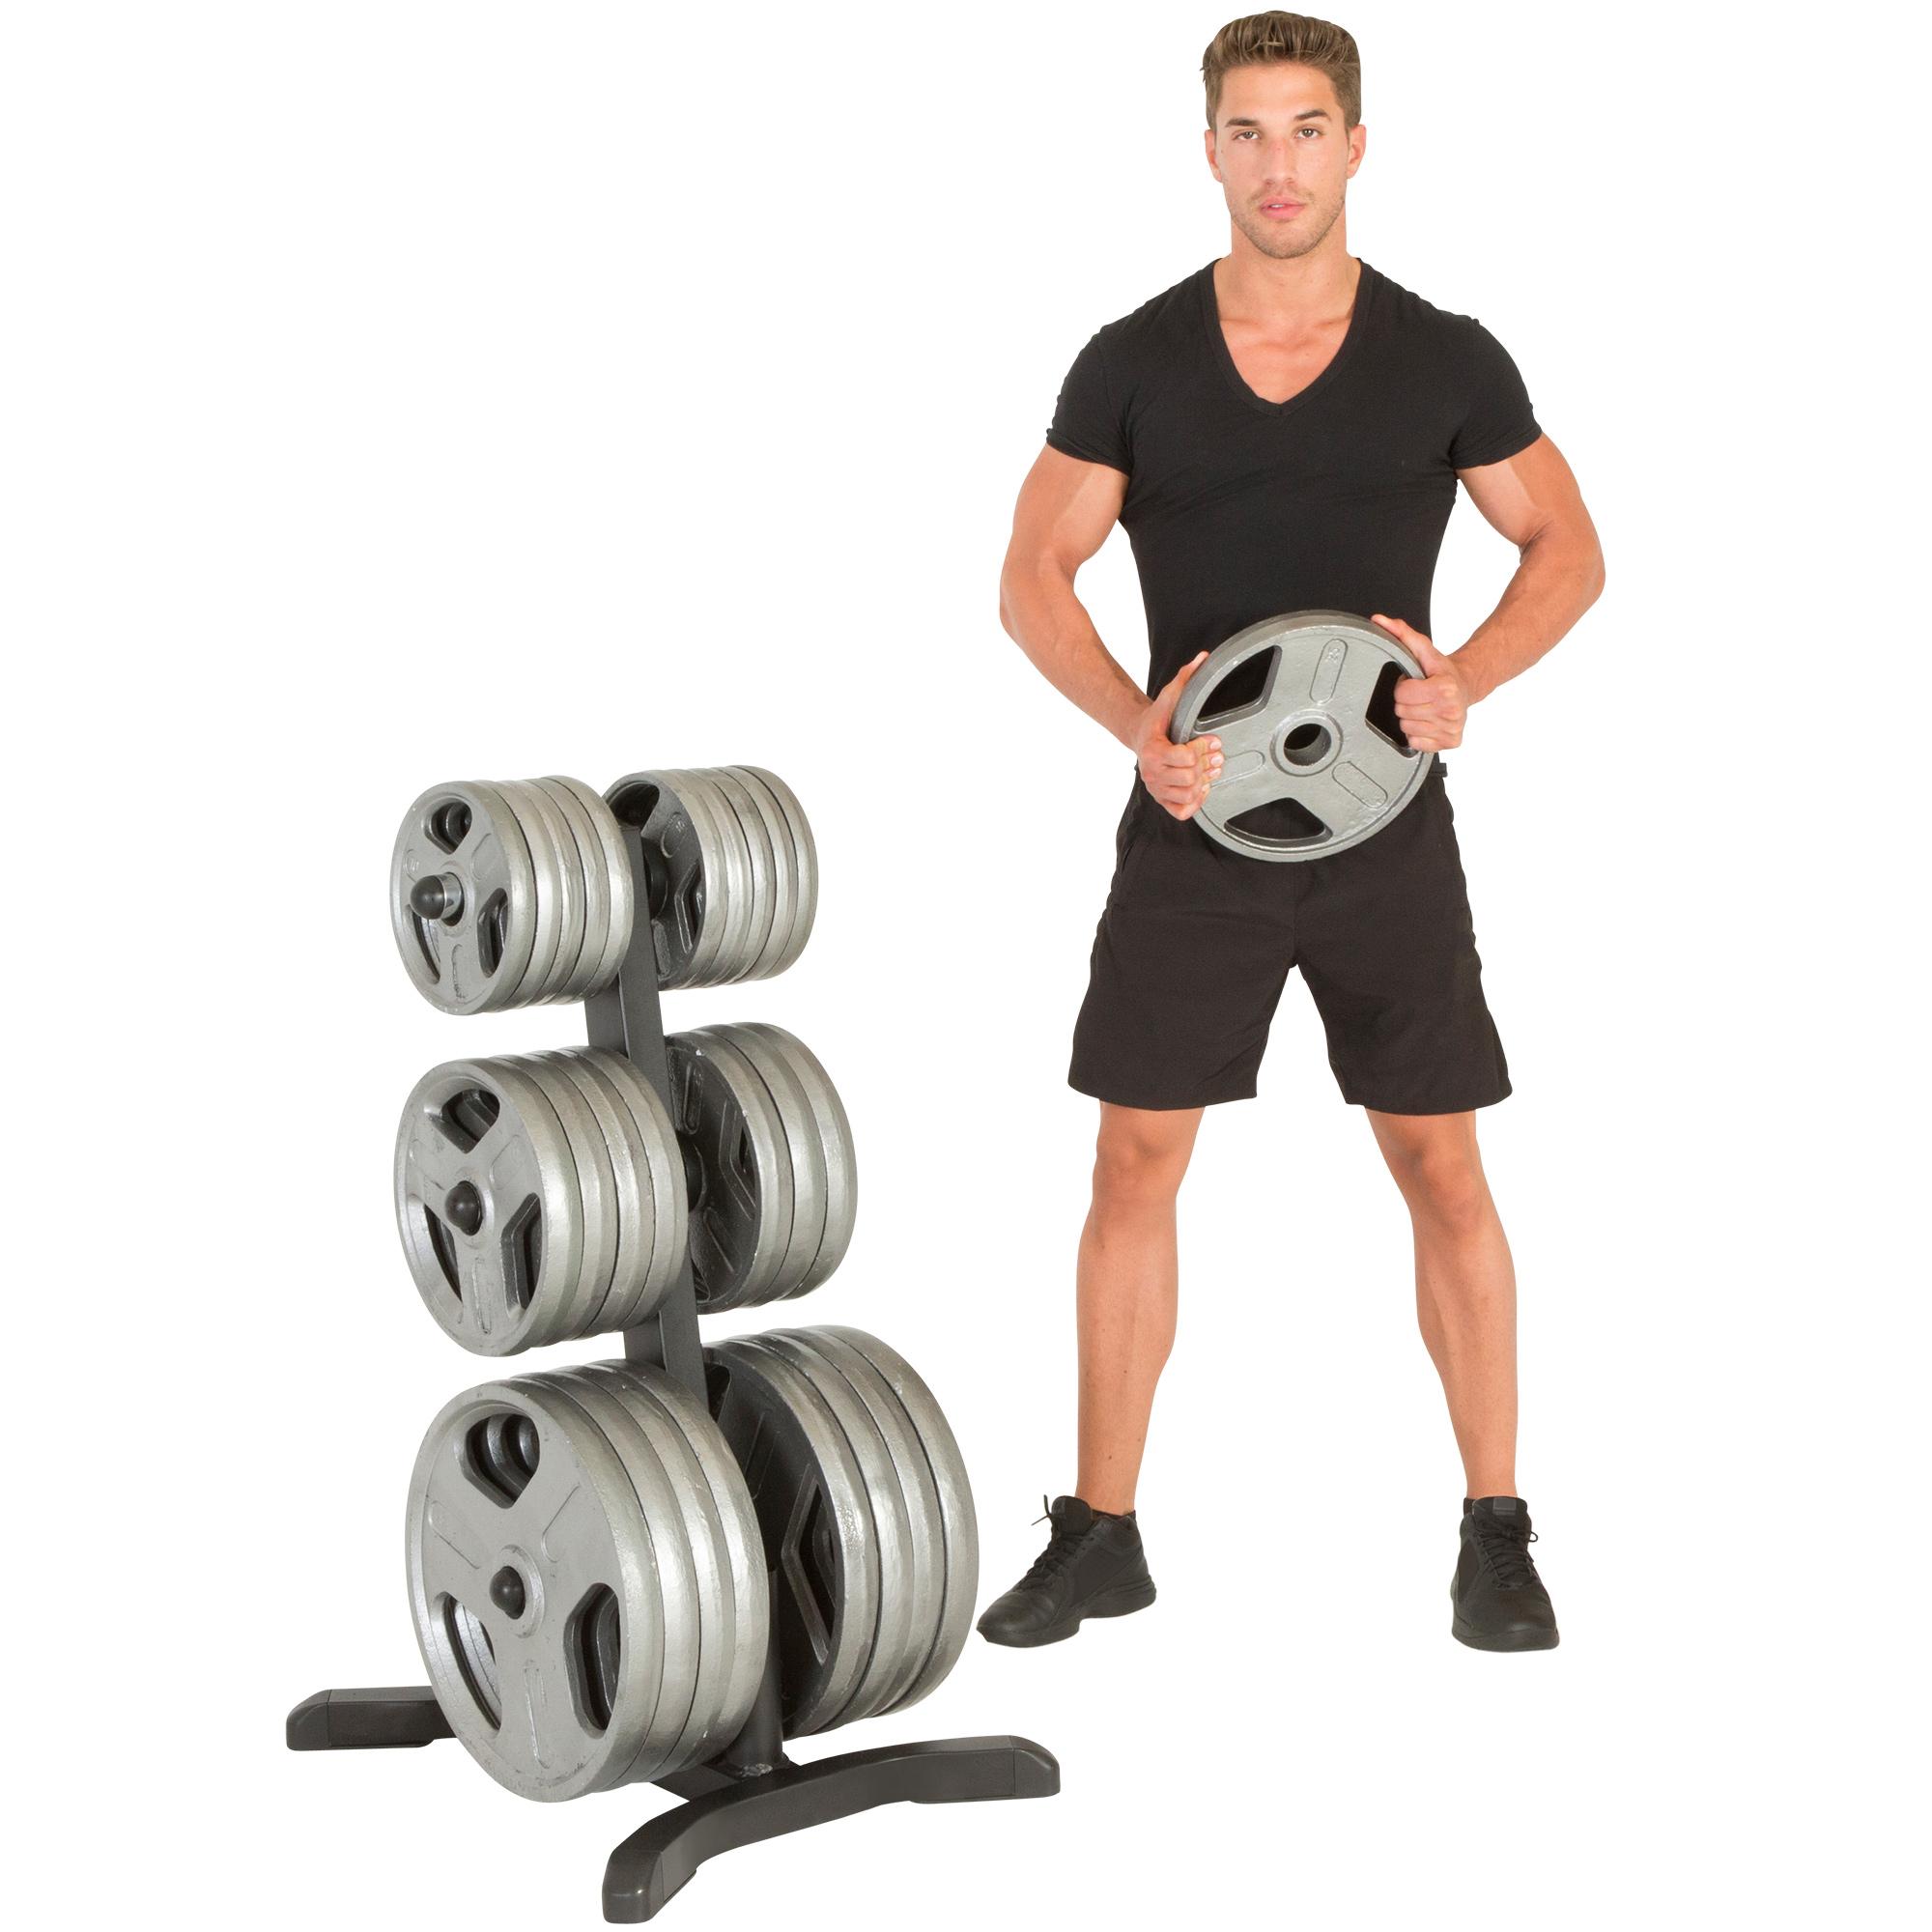 weight racks on sale sears